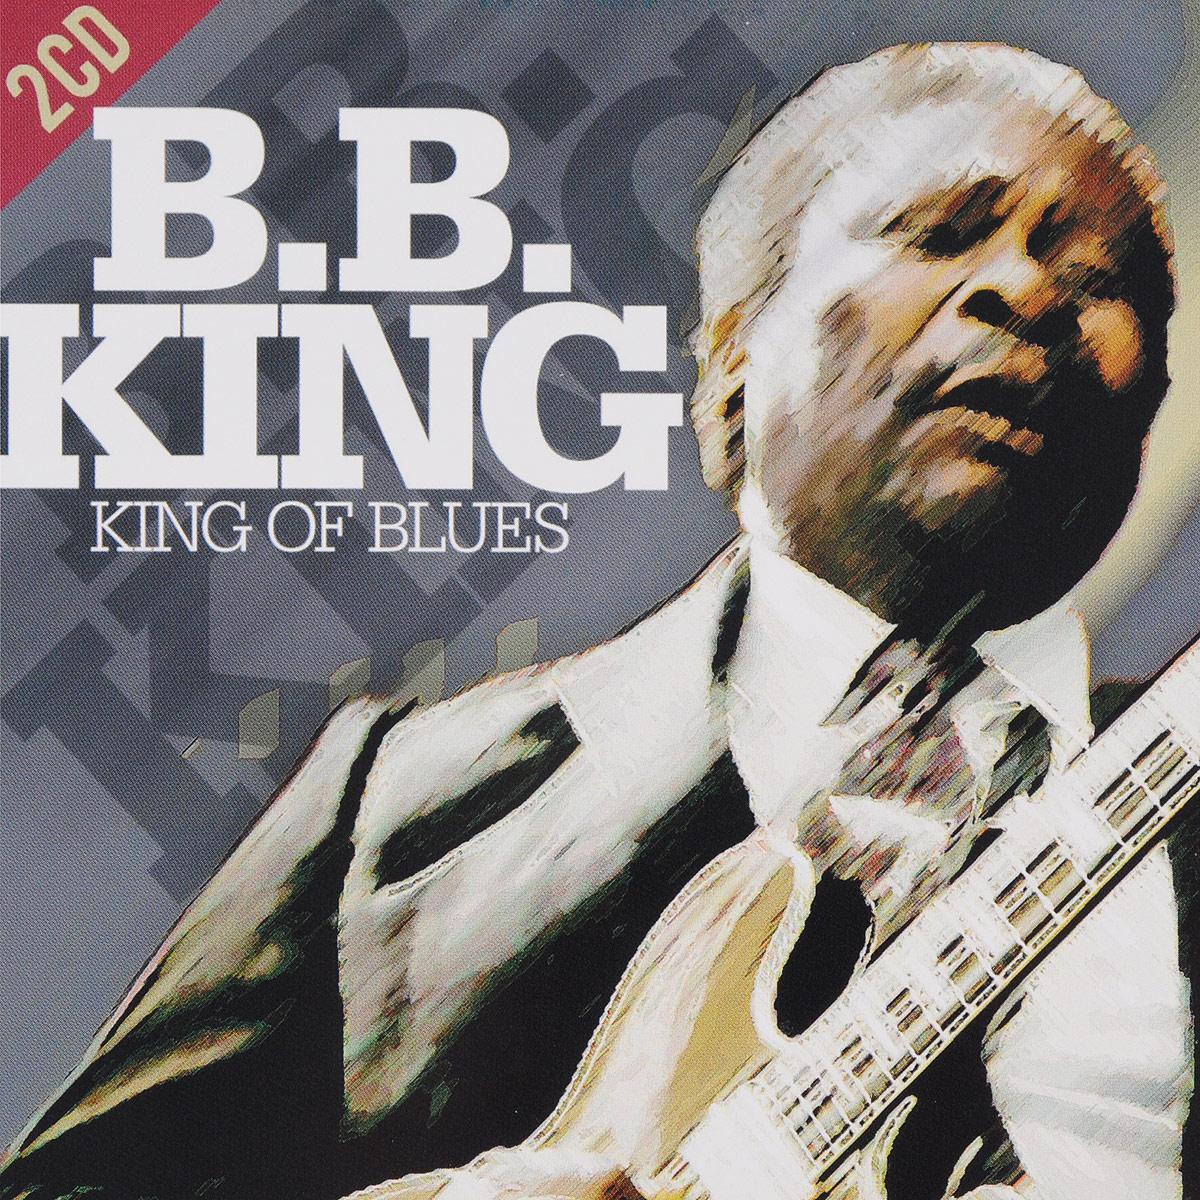 Би Би Кинг B. B. King. King Of Blues (2 CD) би би кинг b b king